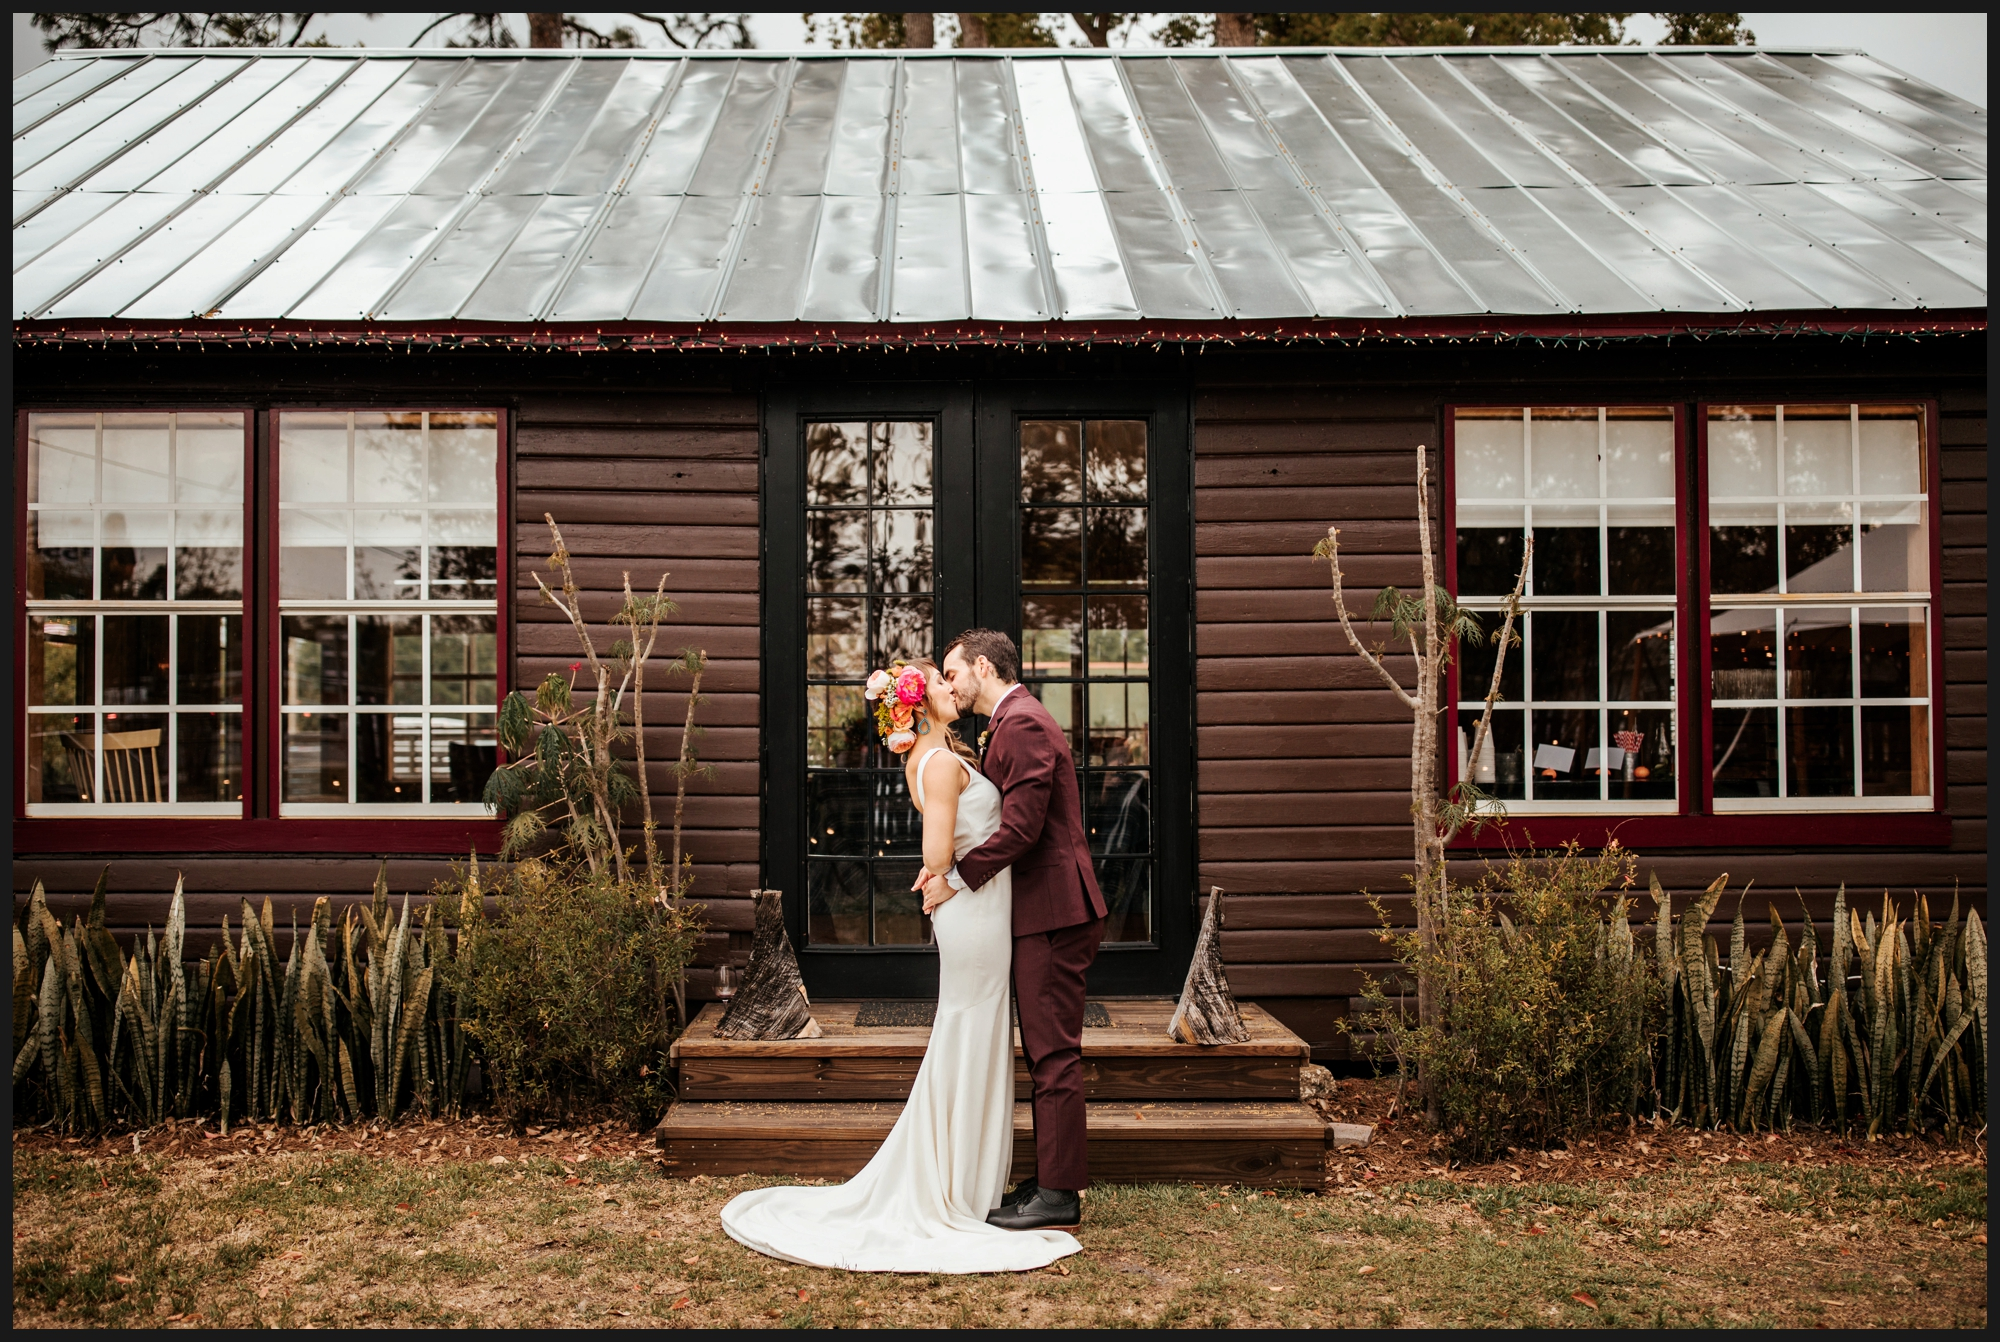 Orlando-Wedding-Photographer-destination-wedding-photographer-florida-wedding-photographer-bohemian-wedding-photographer_2020.jpg